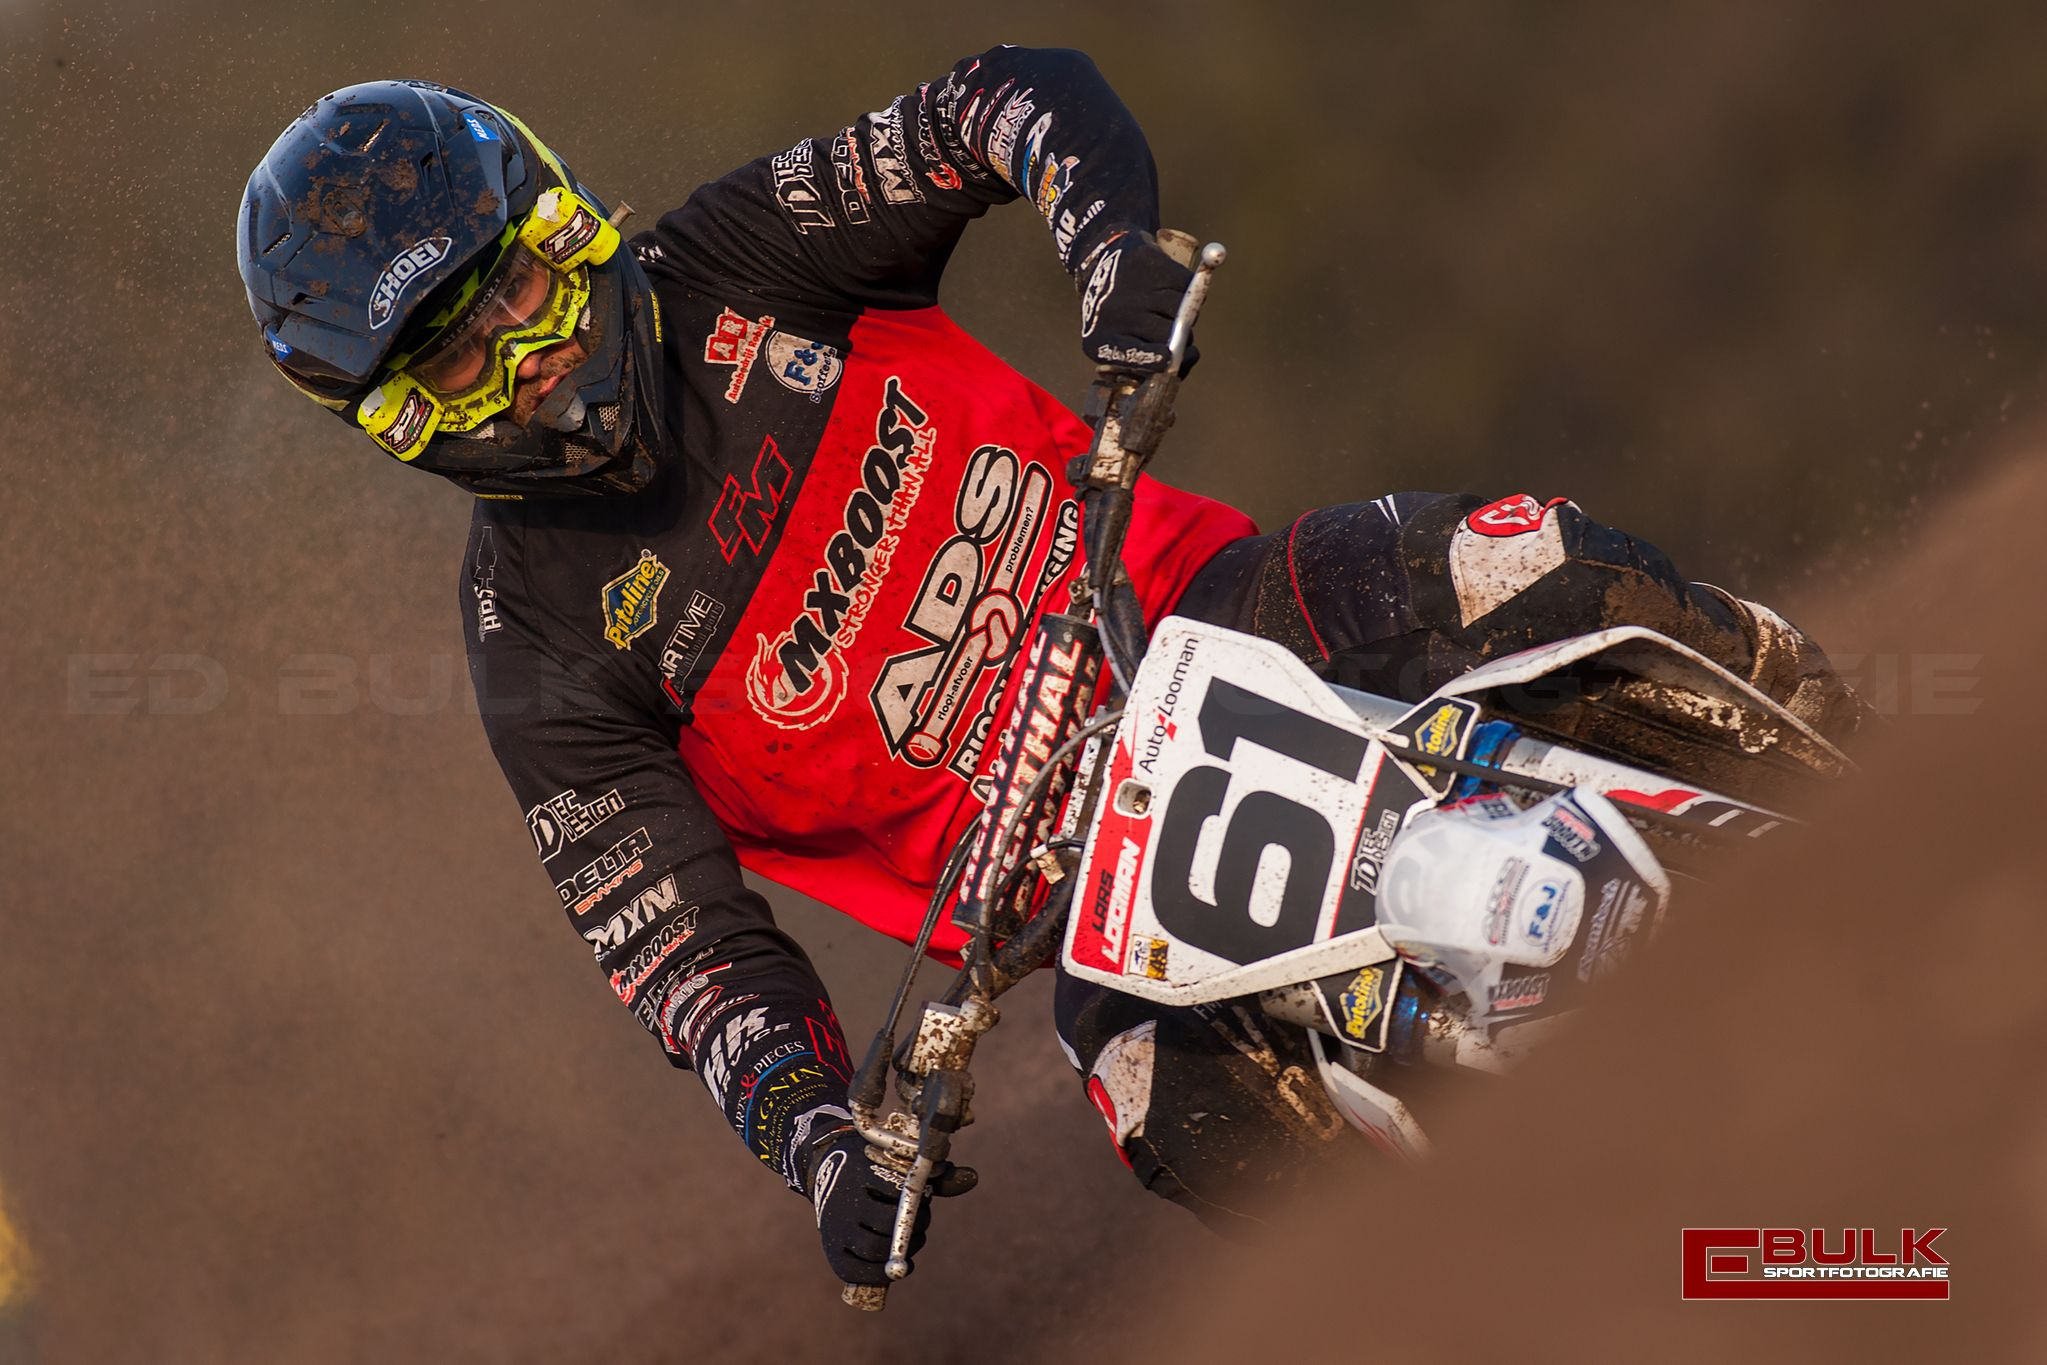 ebs_1741-ed_bulk_sportfotografie